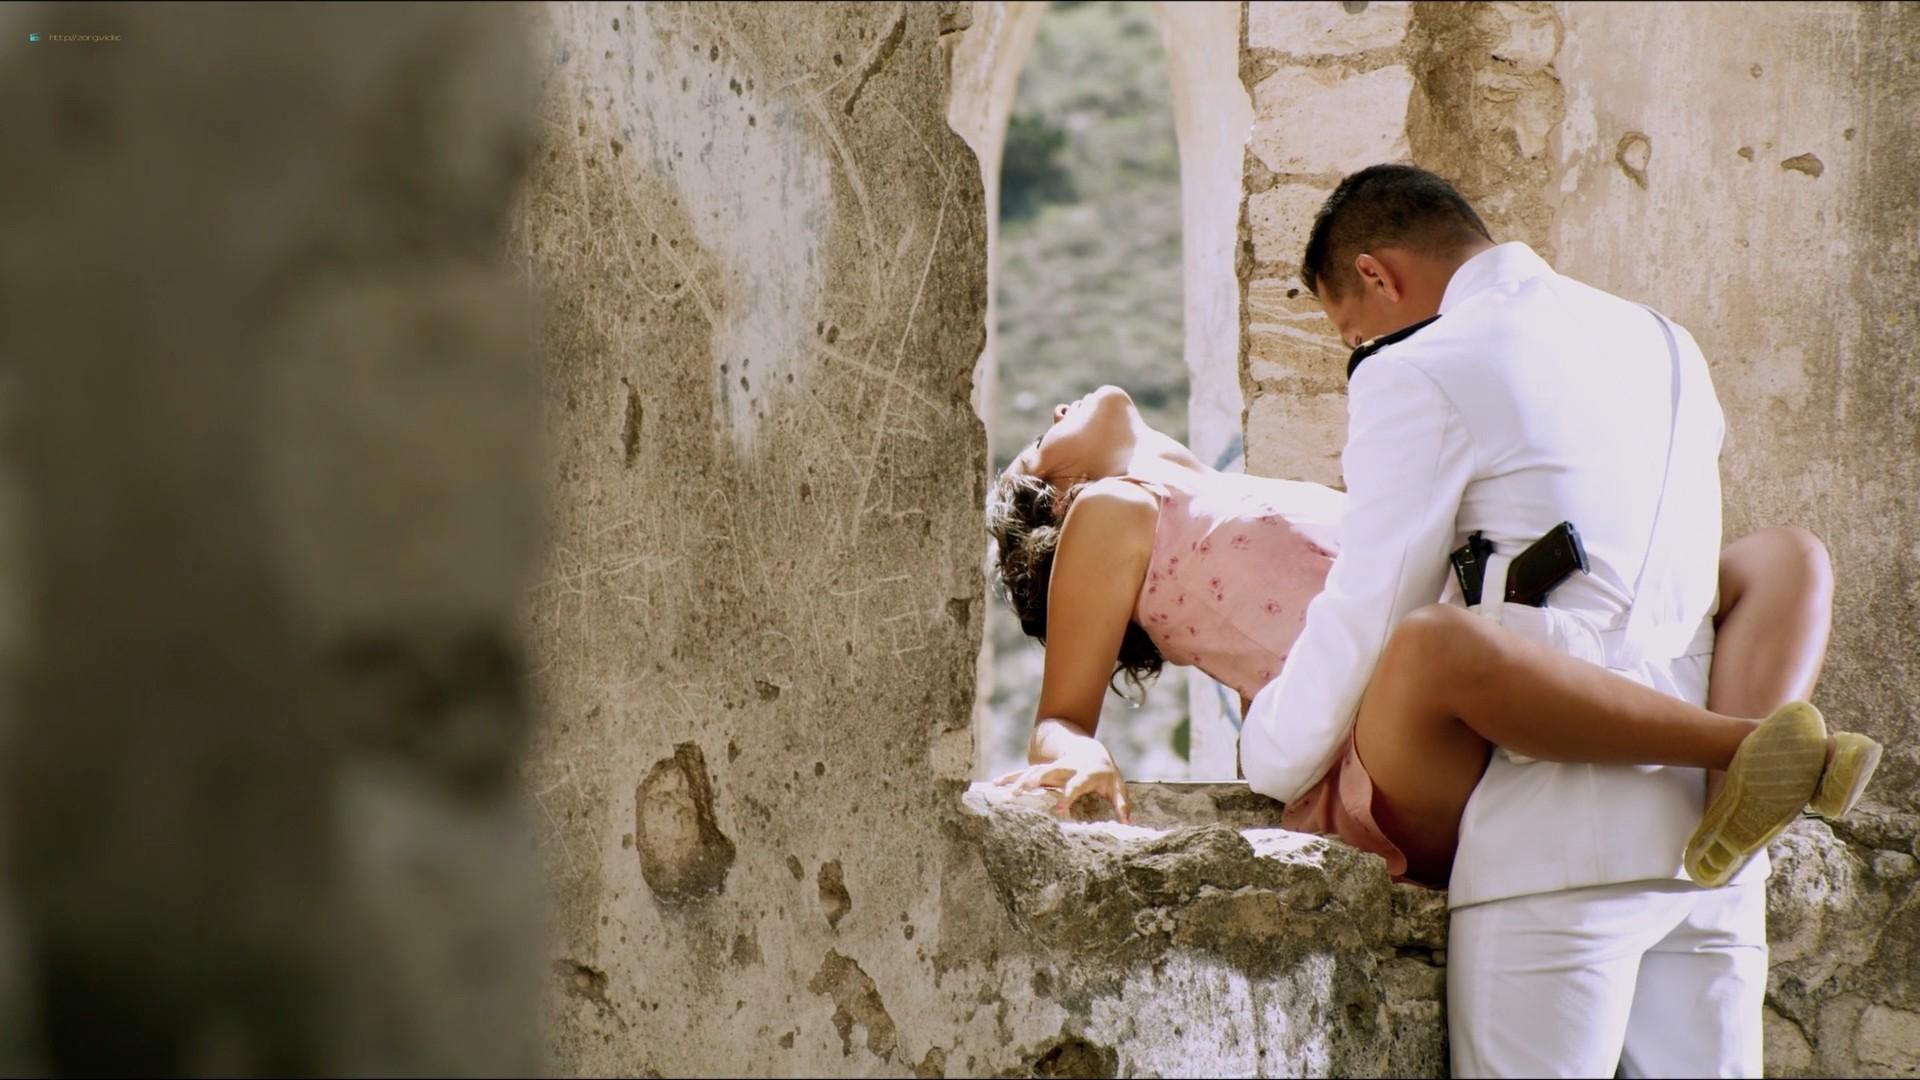 Leonor Varela hot and sex Paulina Gaitan, Paola Nuñez, and others hot and nude - Deseo (2013) HD 1080p Web (14)